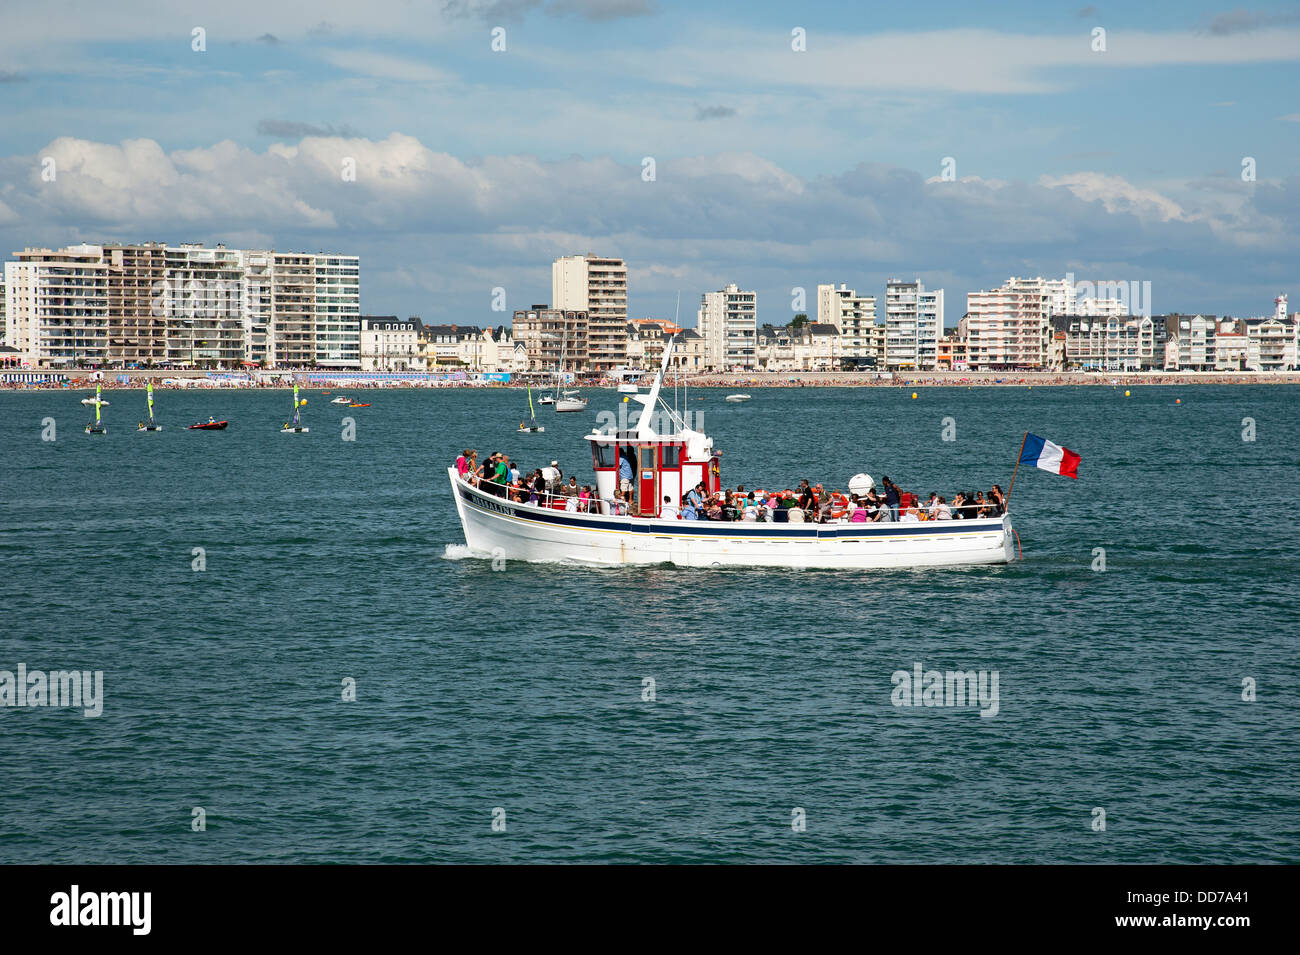 Pleasure boat off Les Sables D'Olonne seafront western France - Stock Image